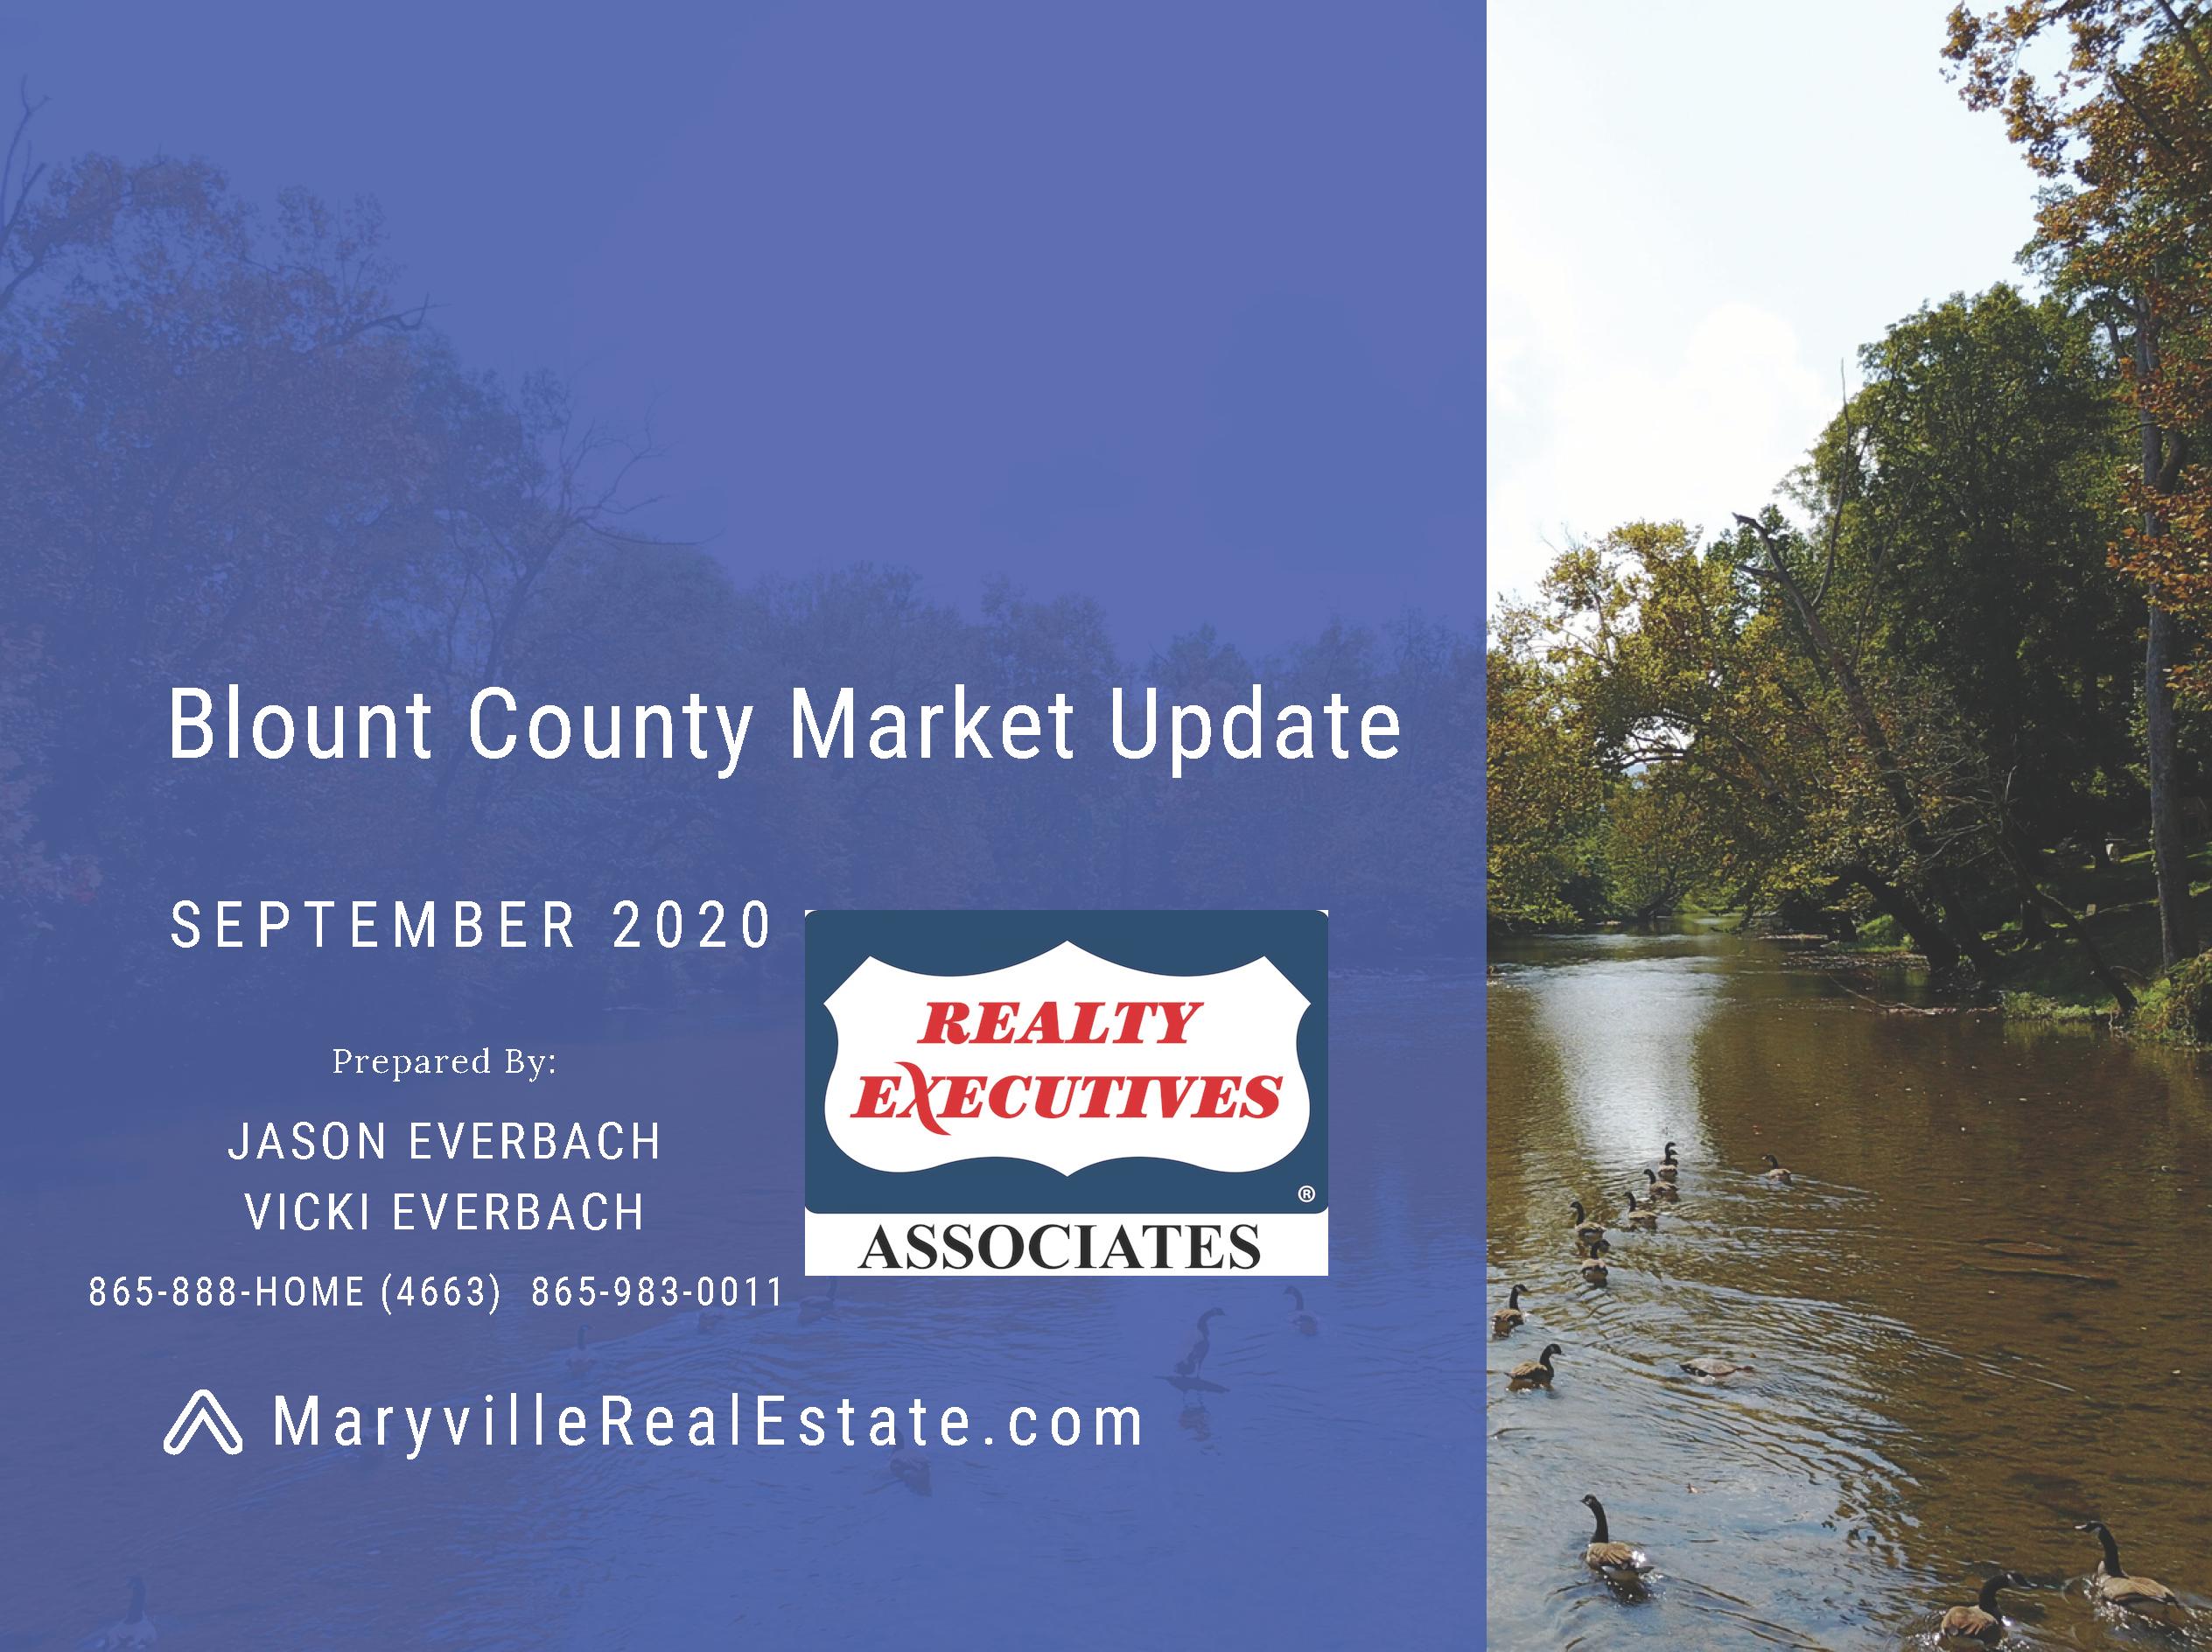 September 2020 Blount County Market Update